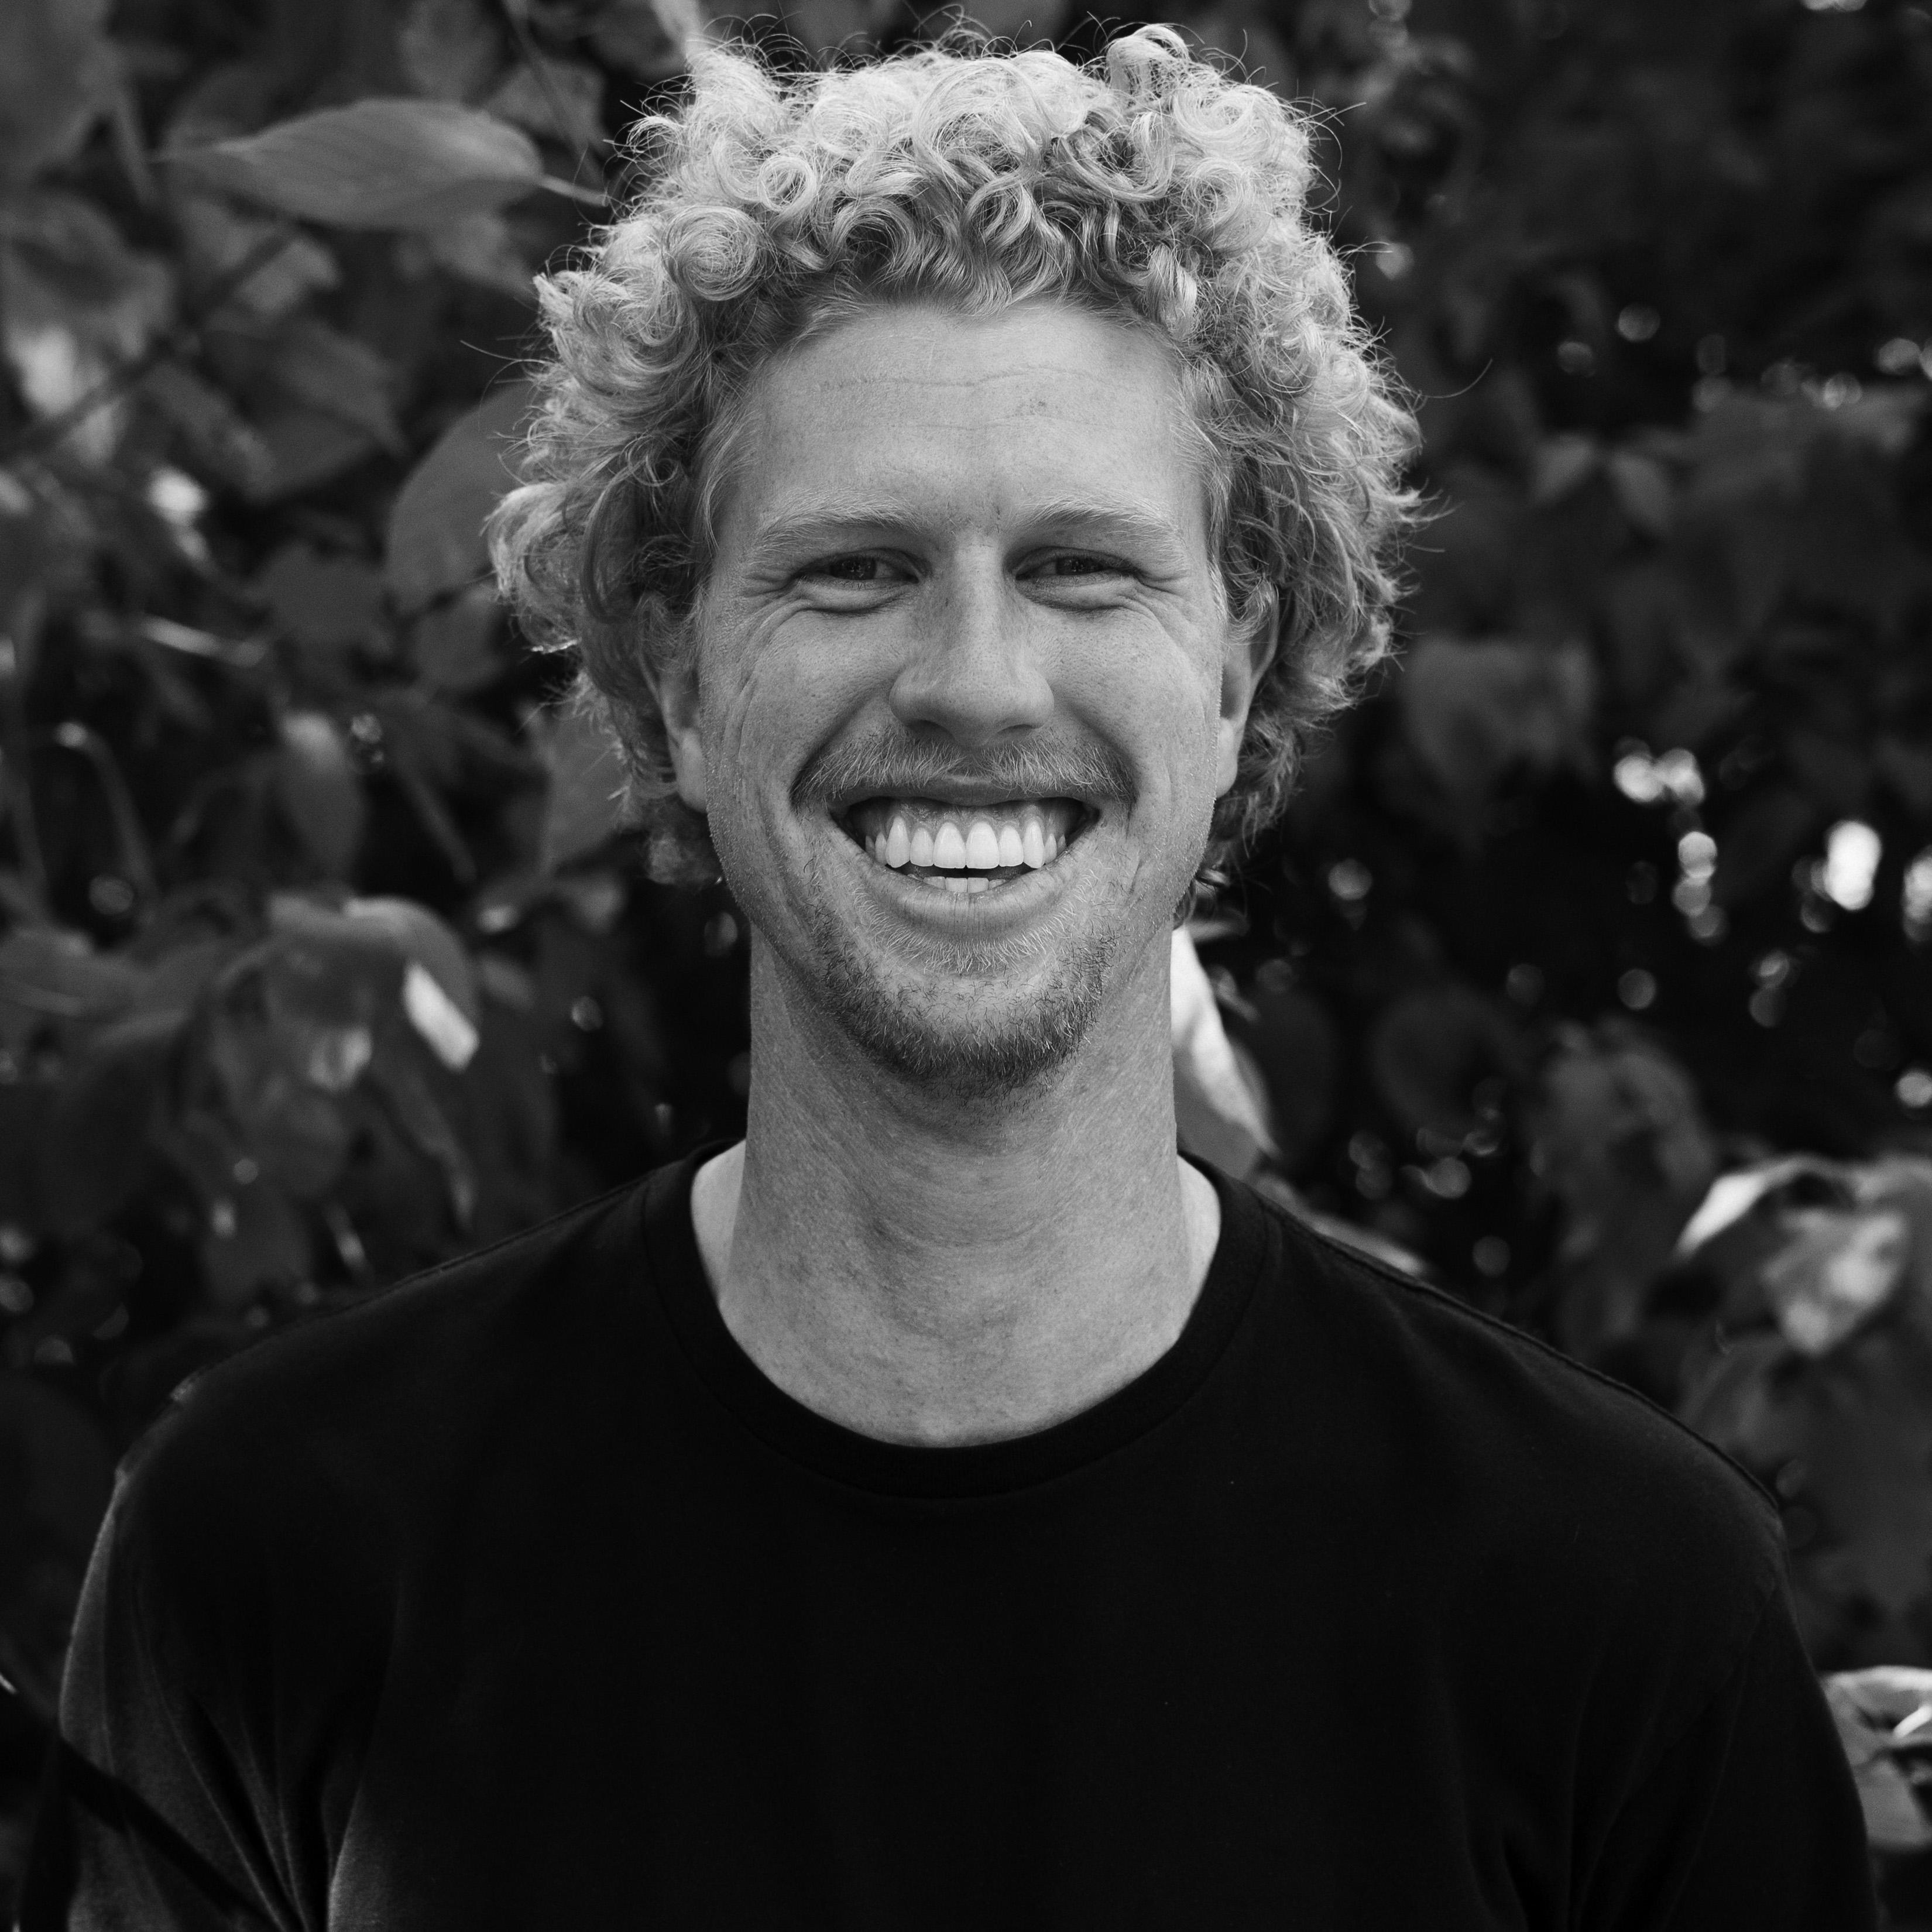 A photograph of product designer Peter Van Liefde.